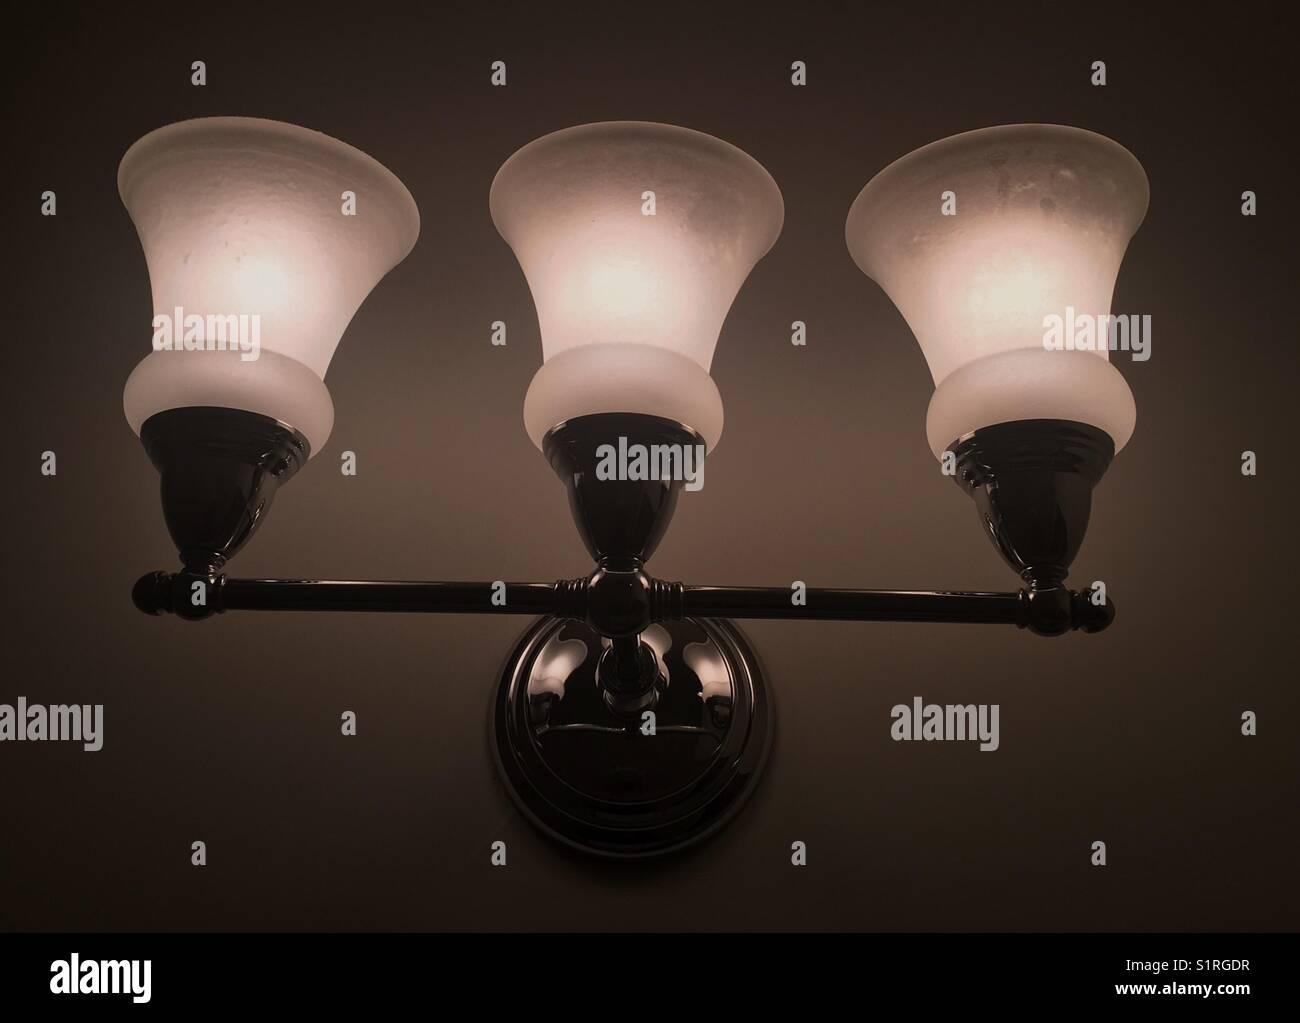 Lampe im Badezimmer Stockfoto, Bild: 310919107 - Alamy